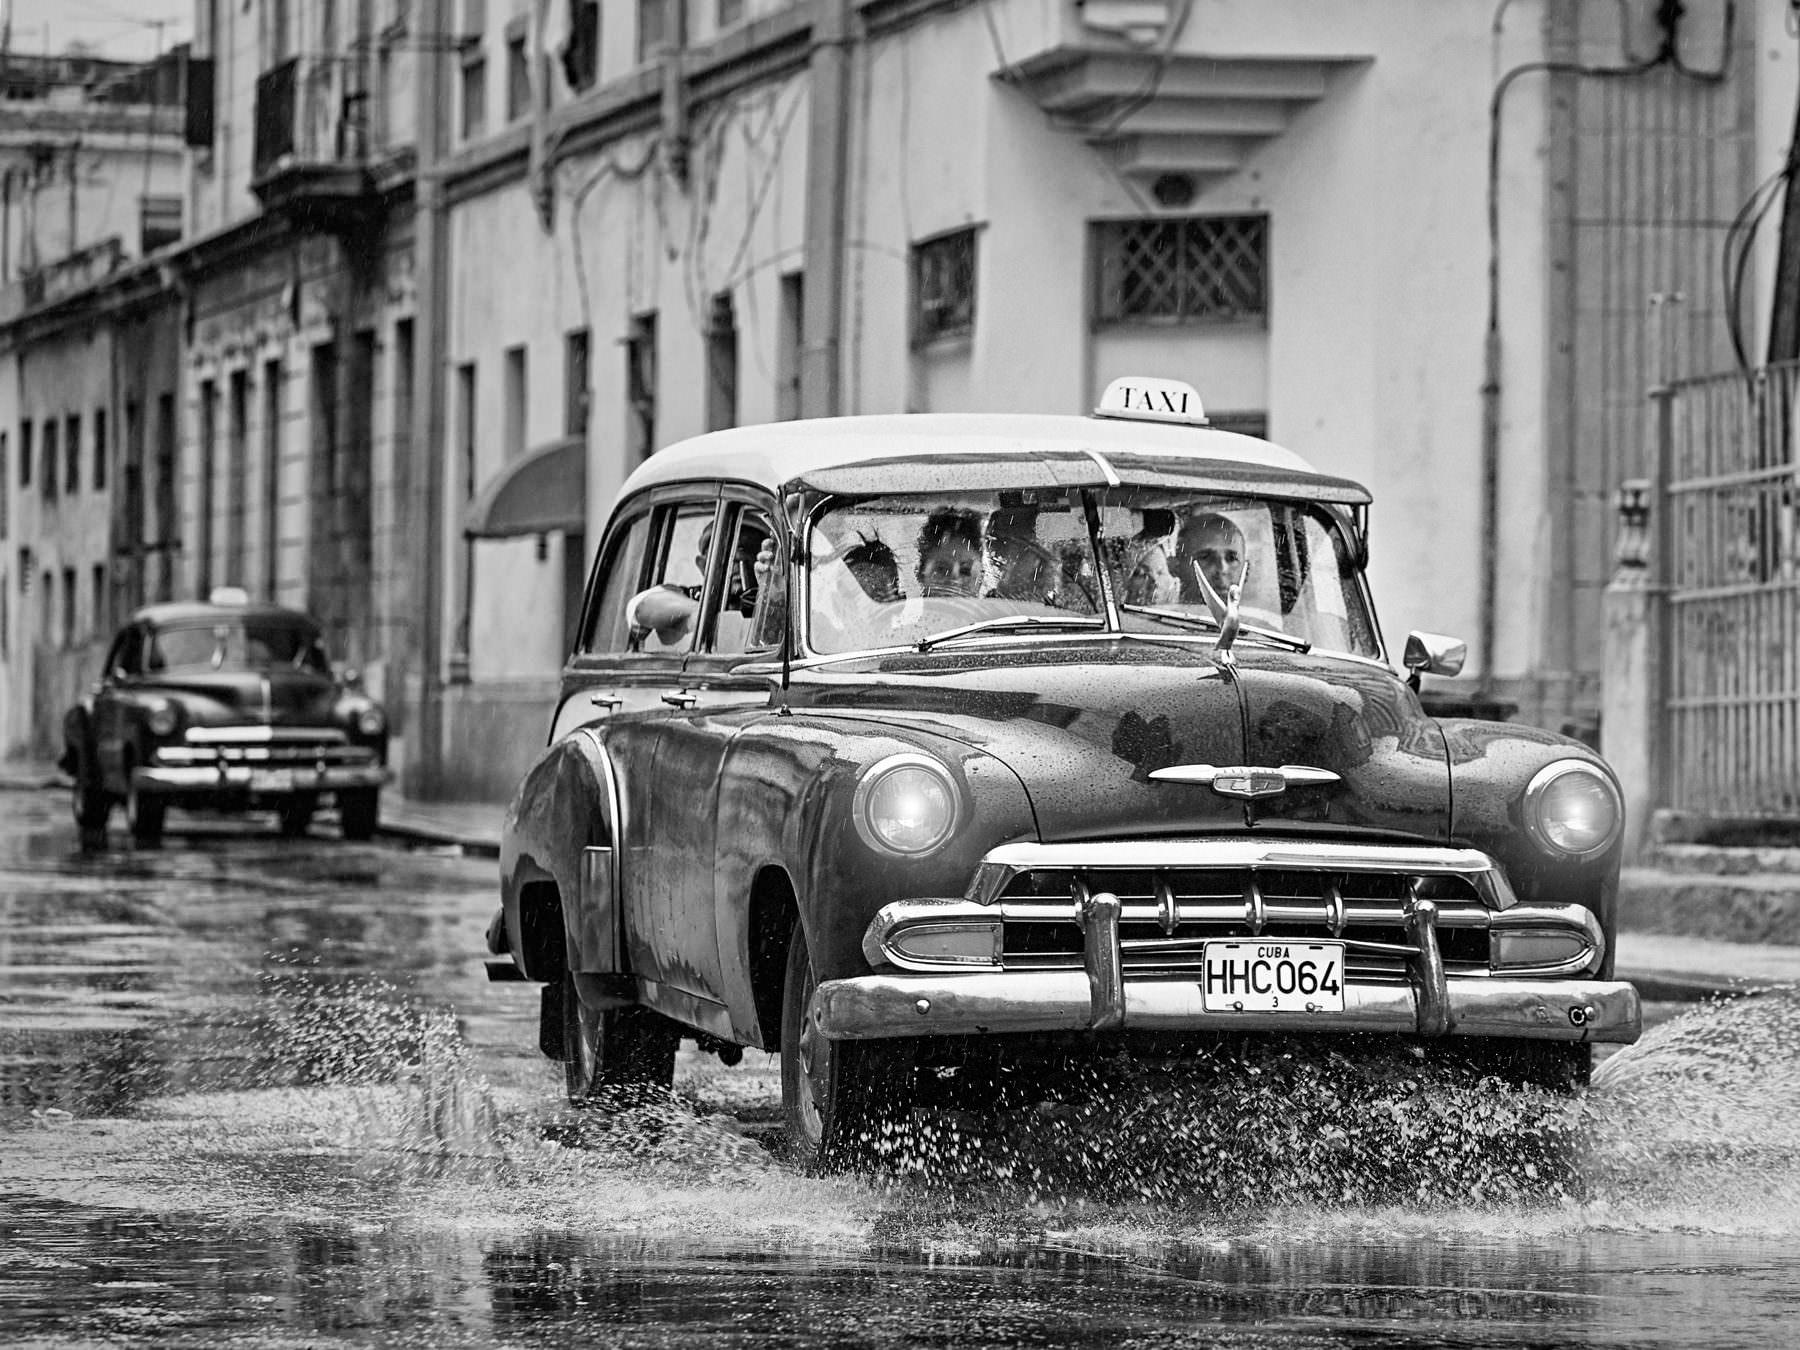 Street photography Cuba Havana Centro Habana - a rainy Monday. Copyright © by Gerry Pacher